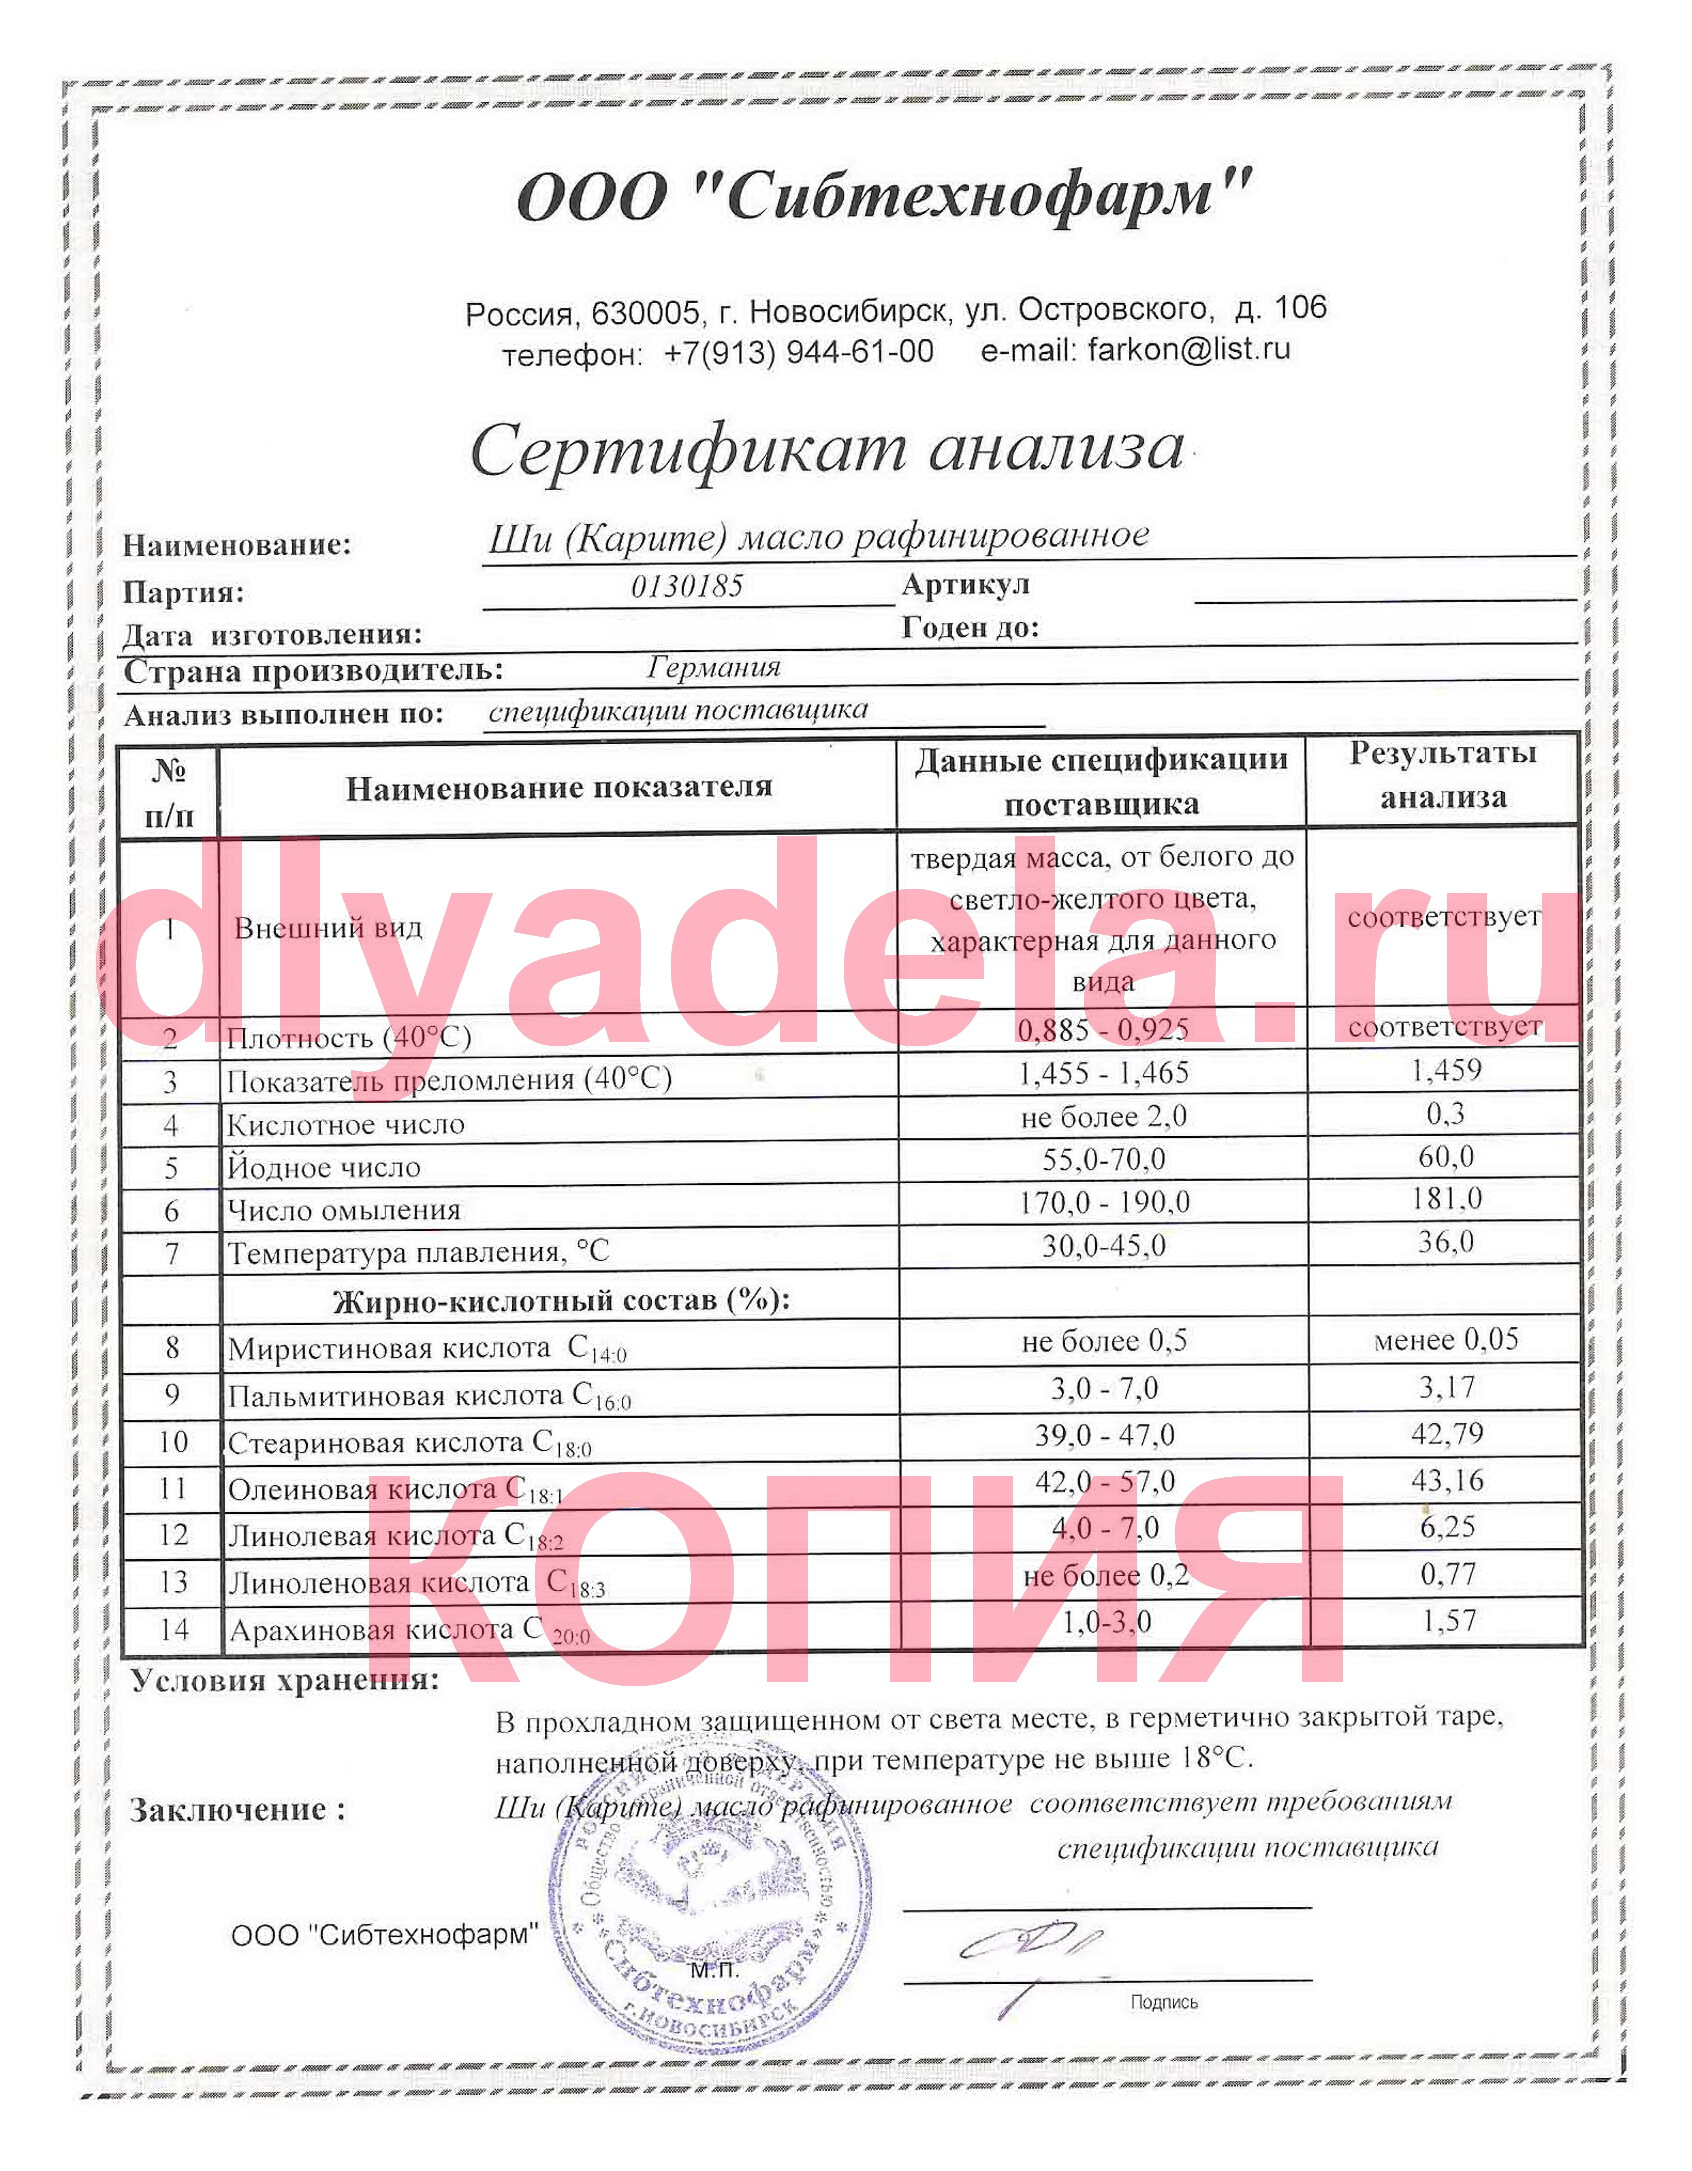 Сертификат_анализа_масла_ши.jpg